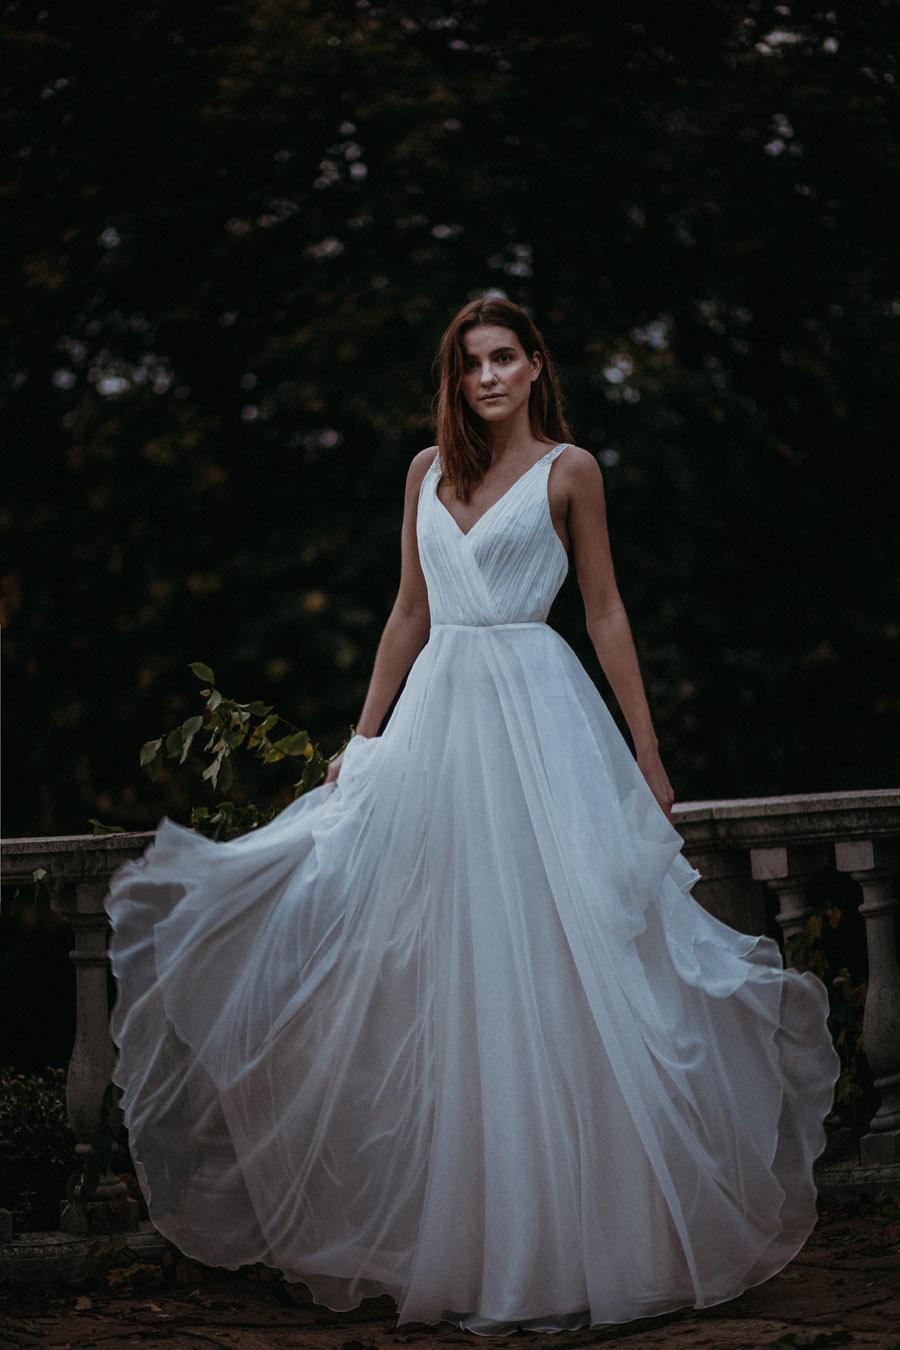 Sanyukta Shrestha autumn daydream bridal collection 2020 (30)